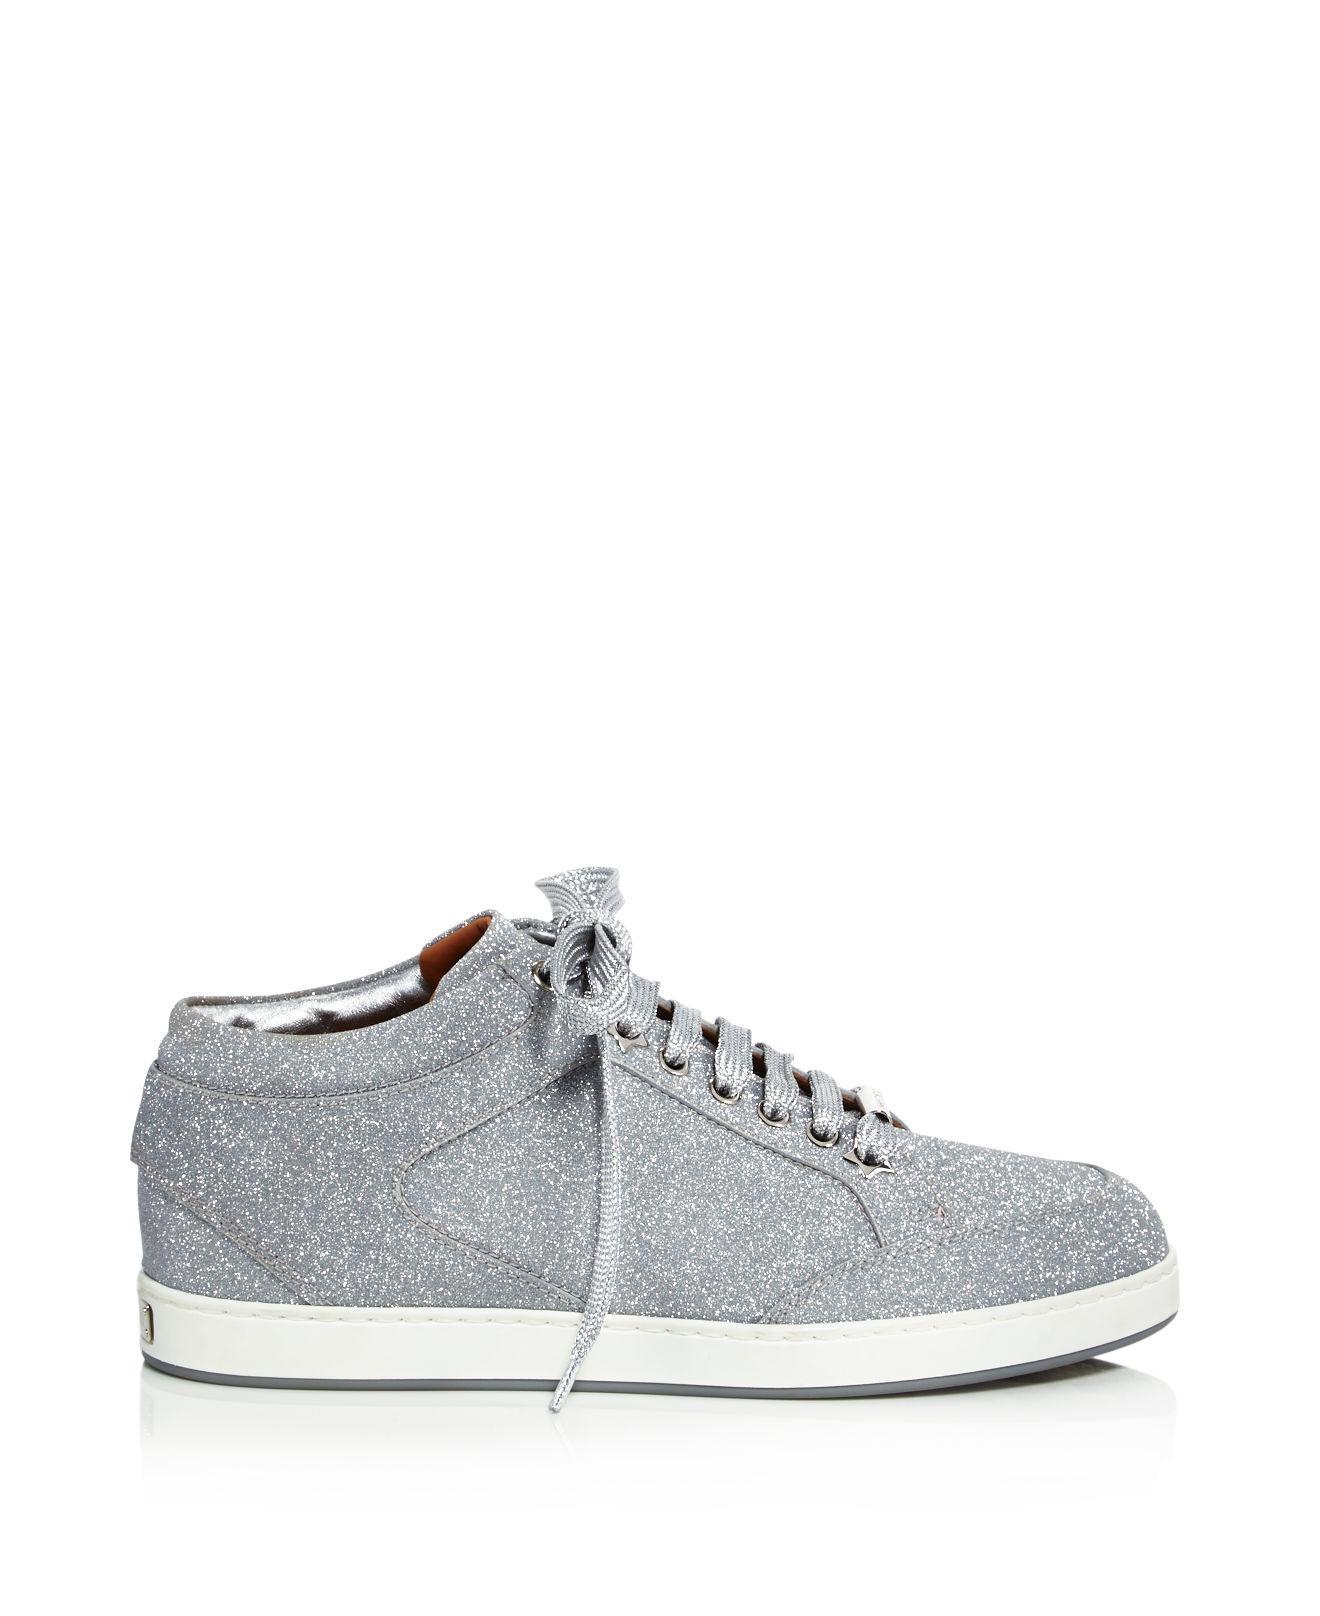 Miami Canvas-paneled Leather Sneakers - White Jimmy Choo London w8wWT6Qd